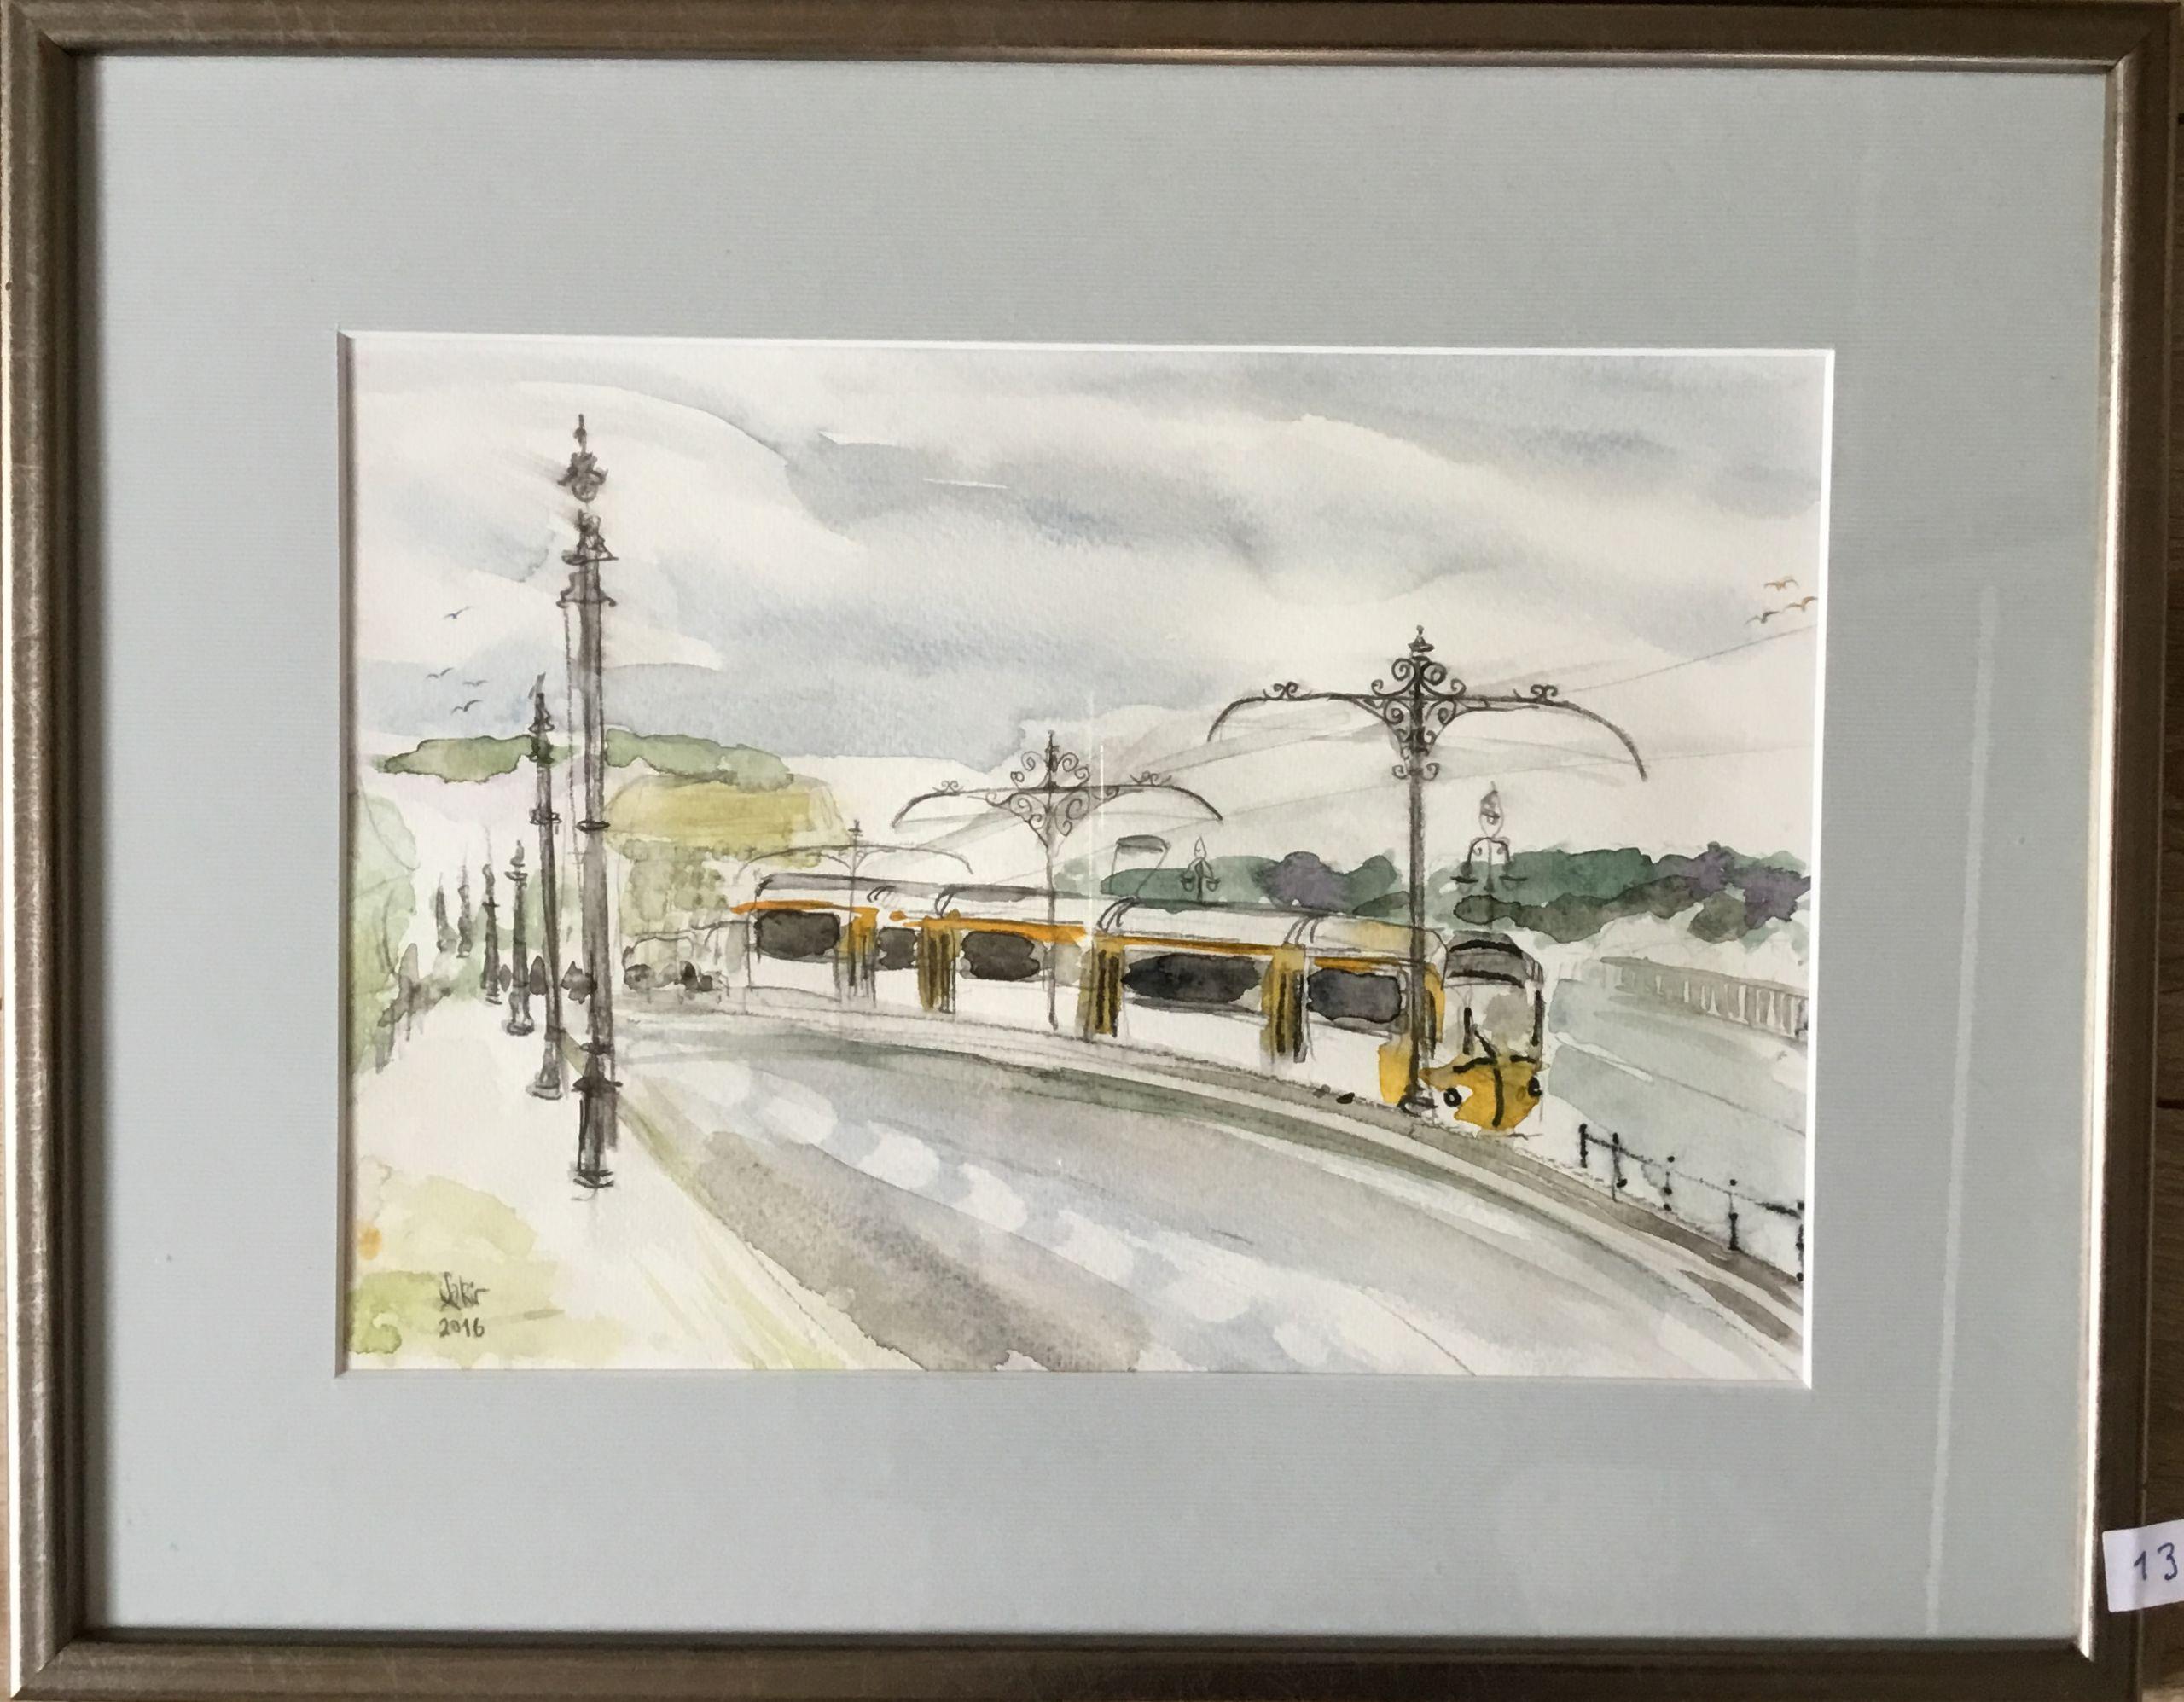 13.Budapeşte Margit Köprüsü, Suluboya, 29×20